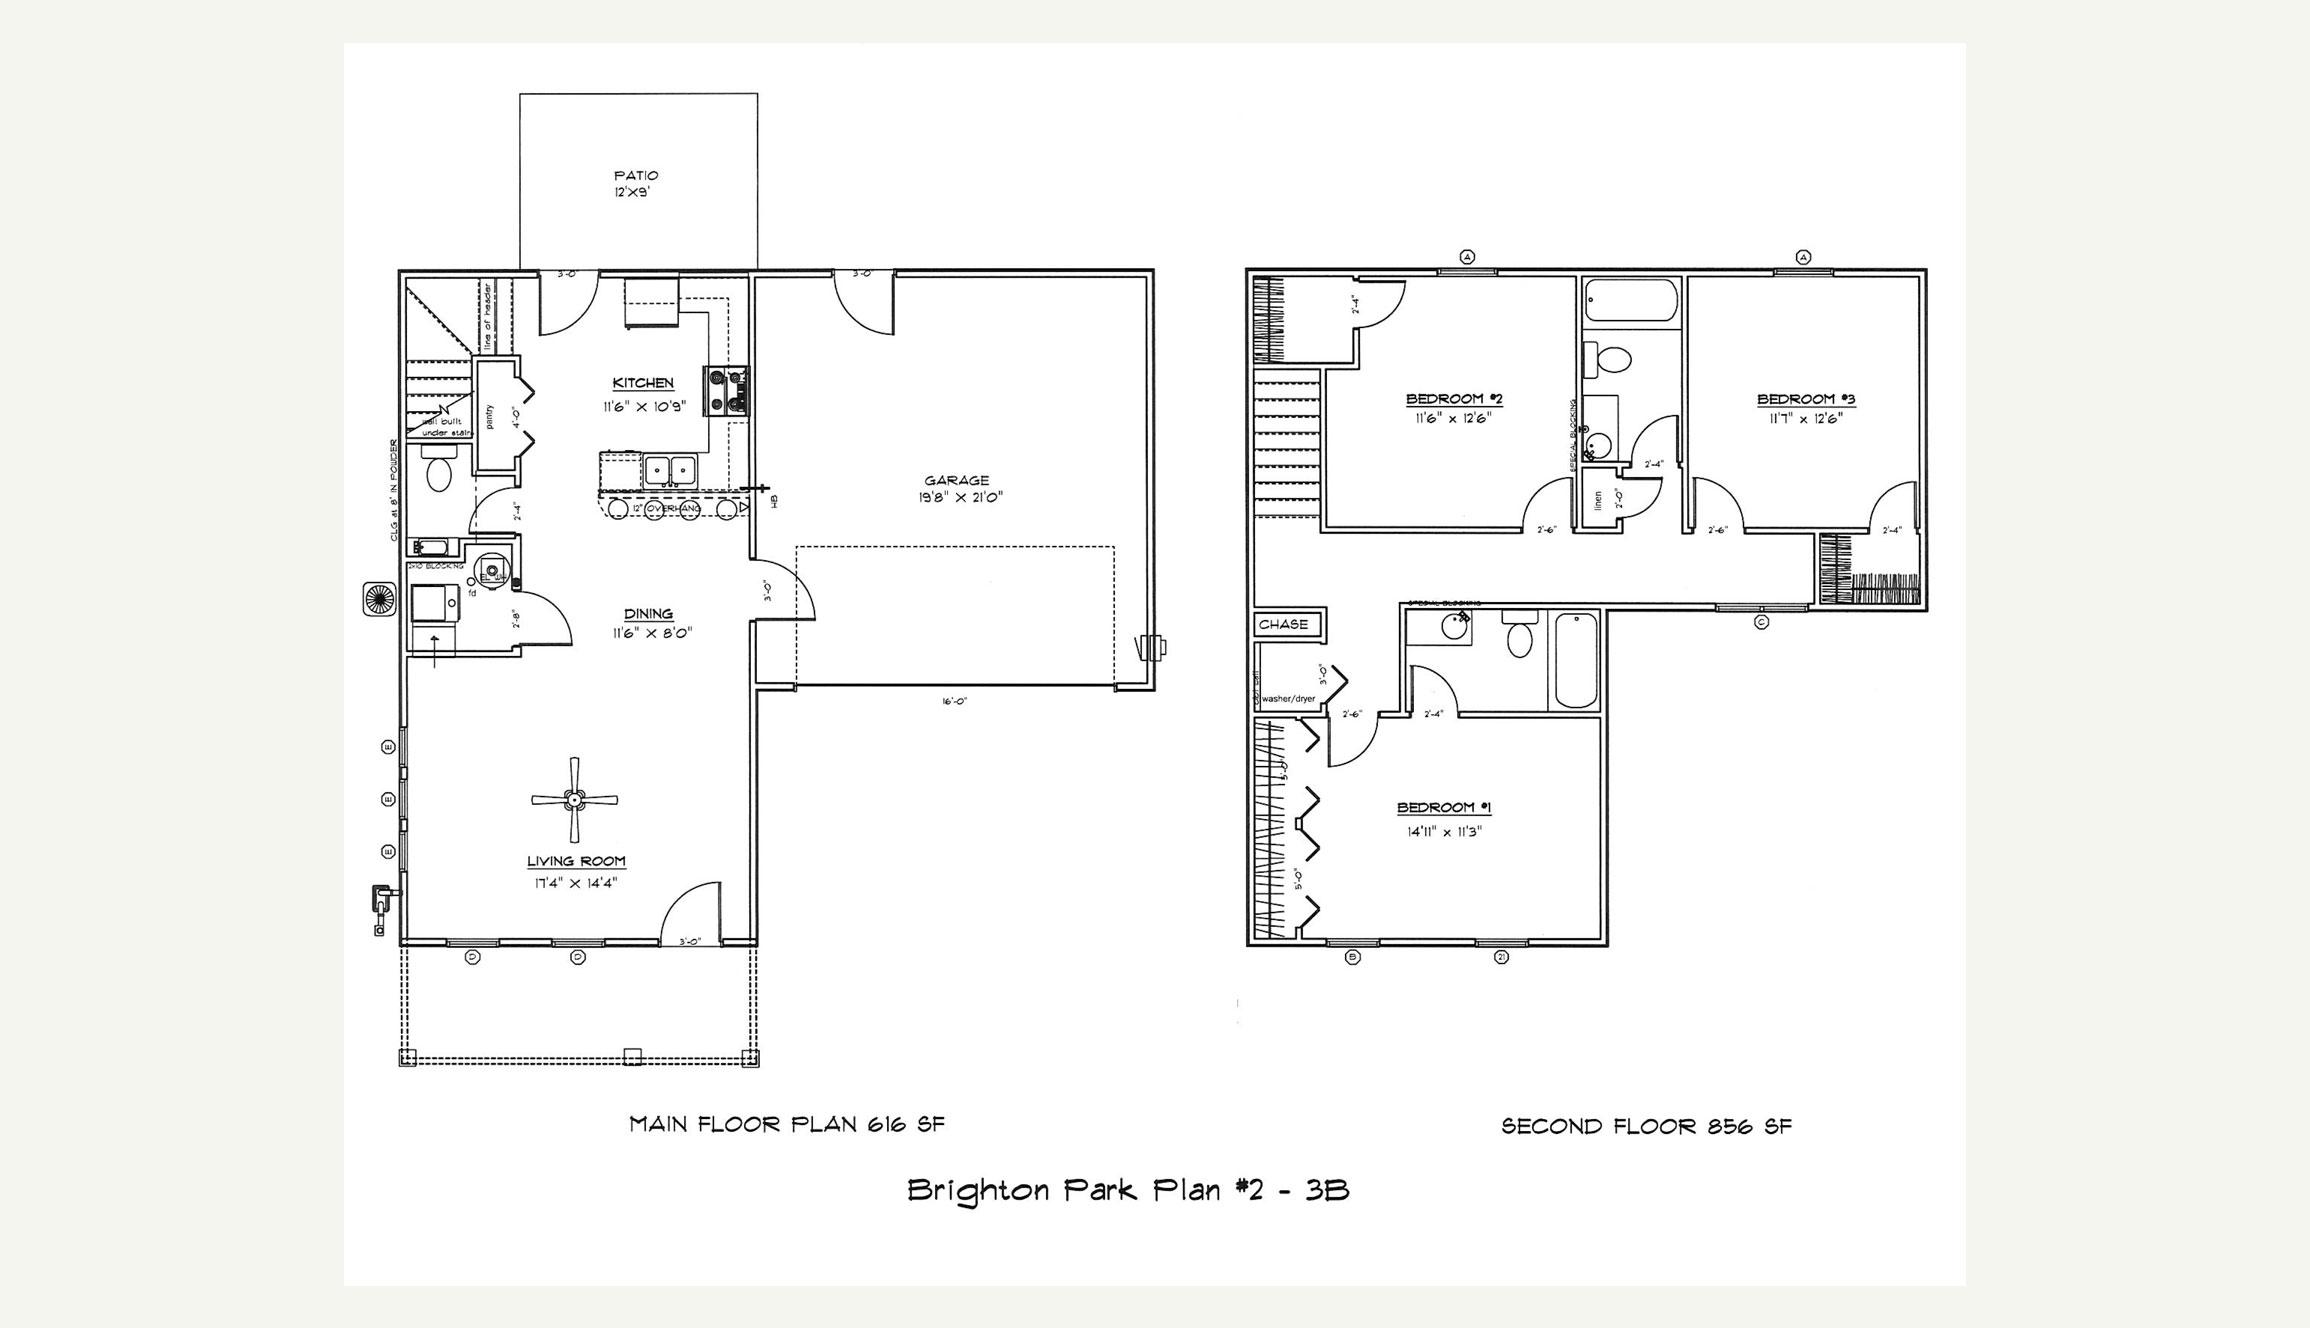 Plan 2 — 3 Bed